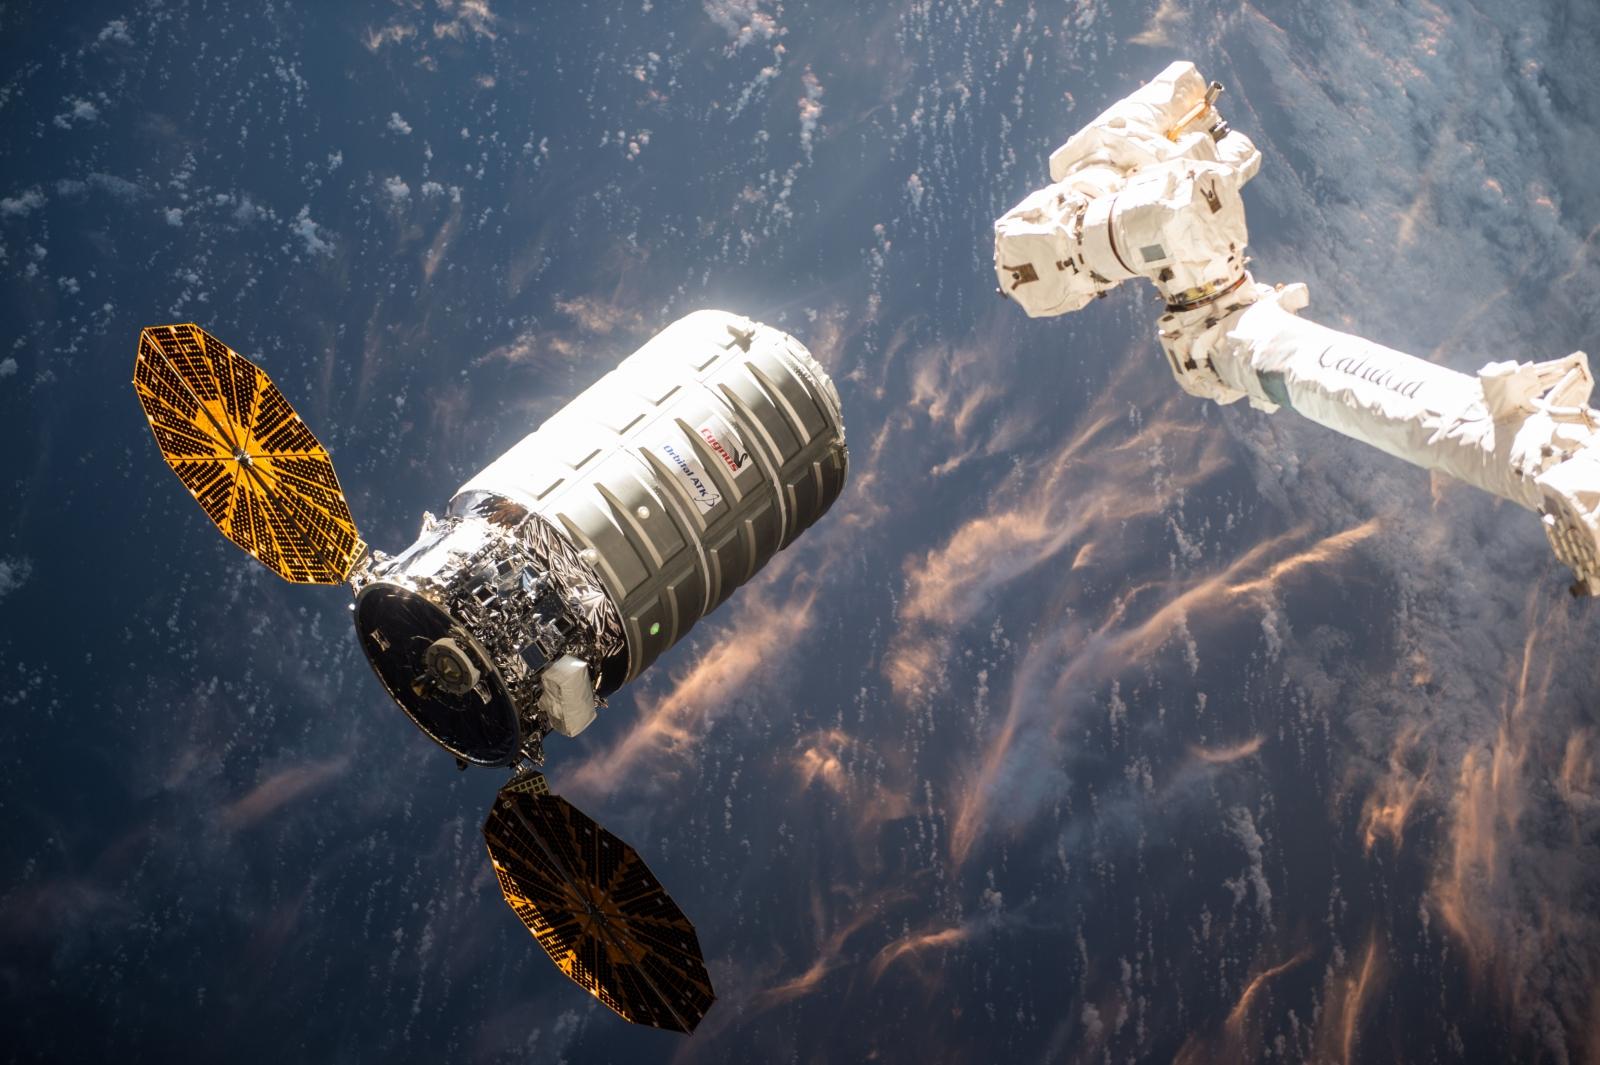 Nasa Saffire Cygnus spacecraft